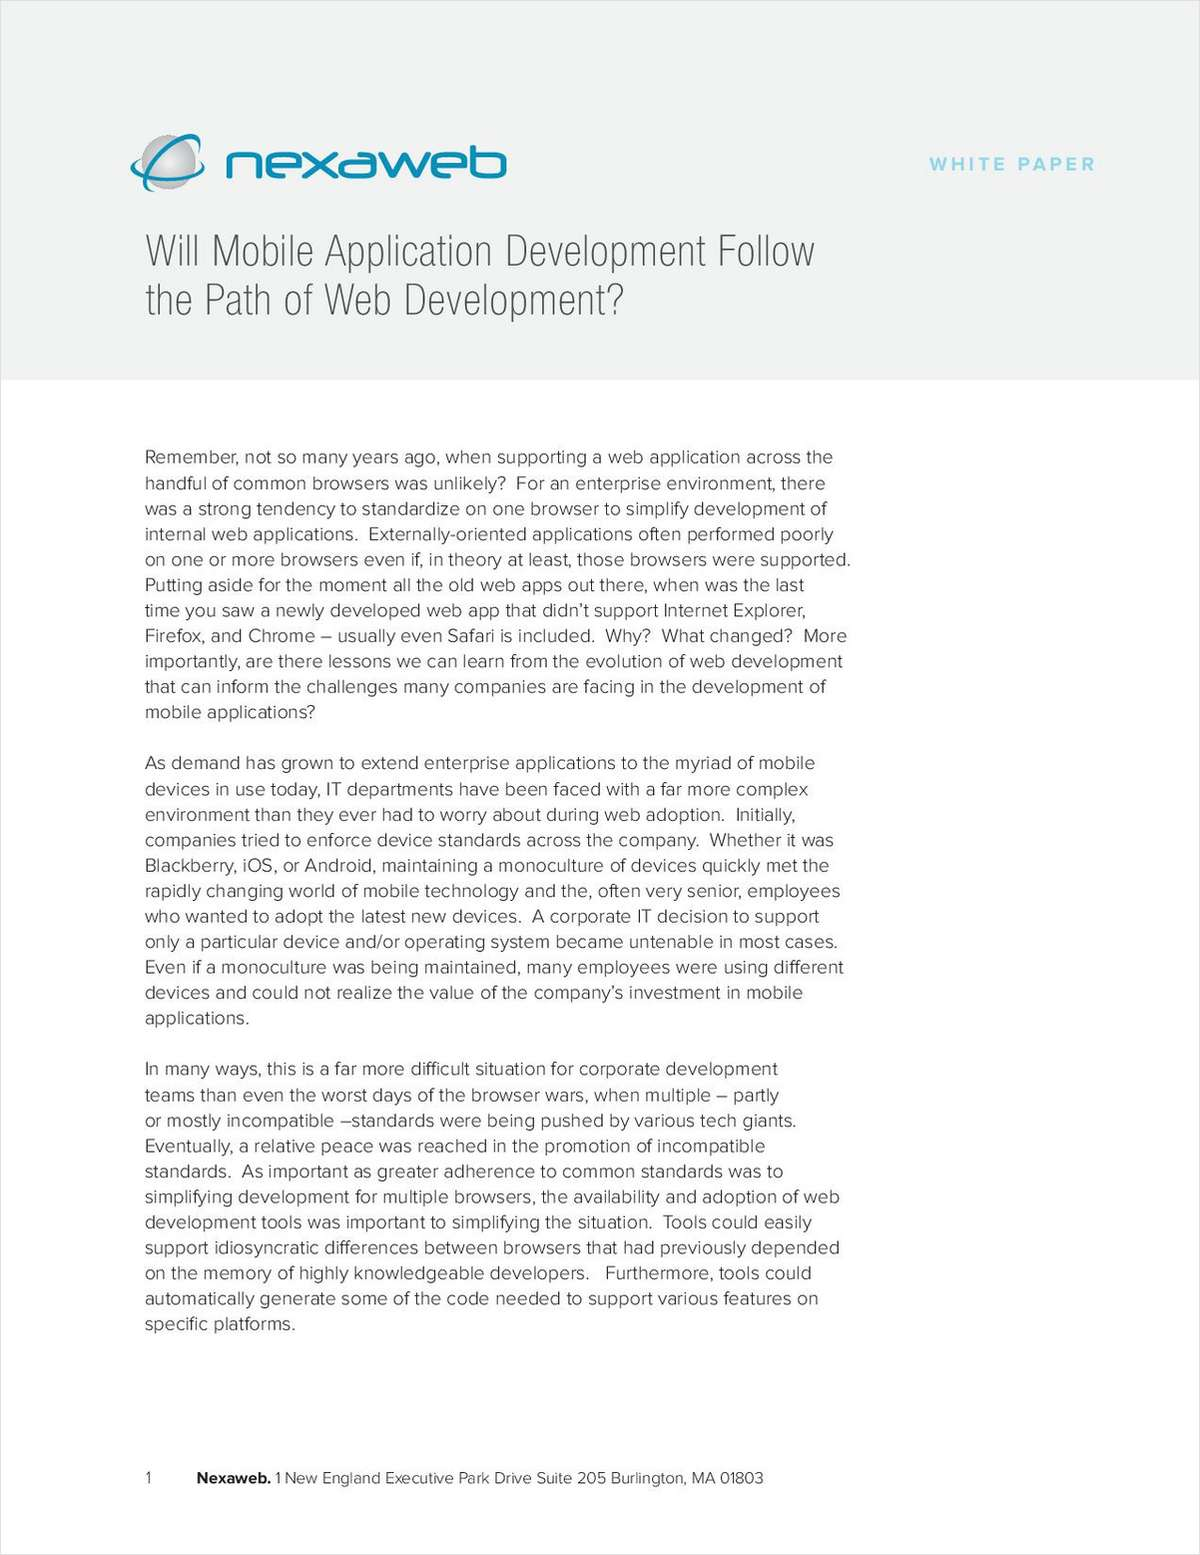 Will Mobile Application Development Follow The Path Of Web Development?